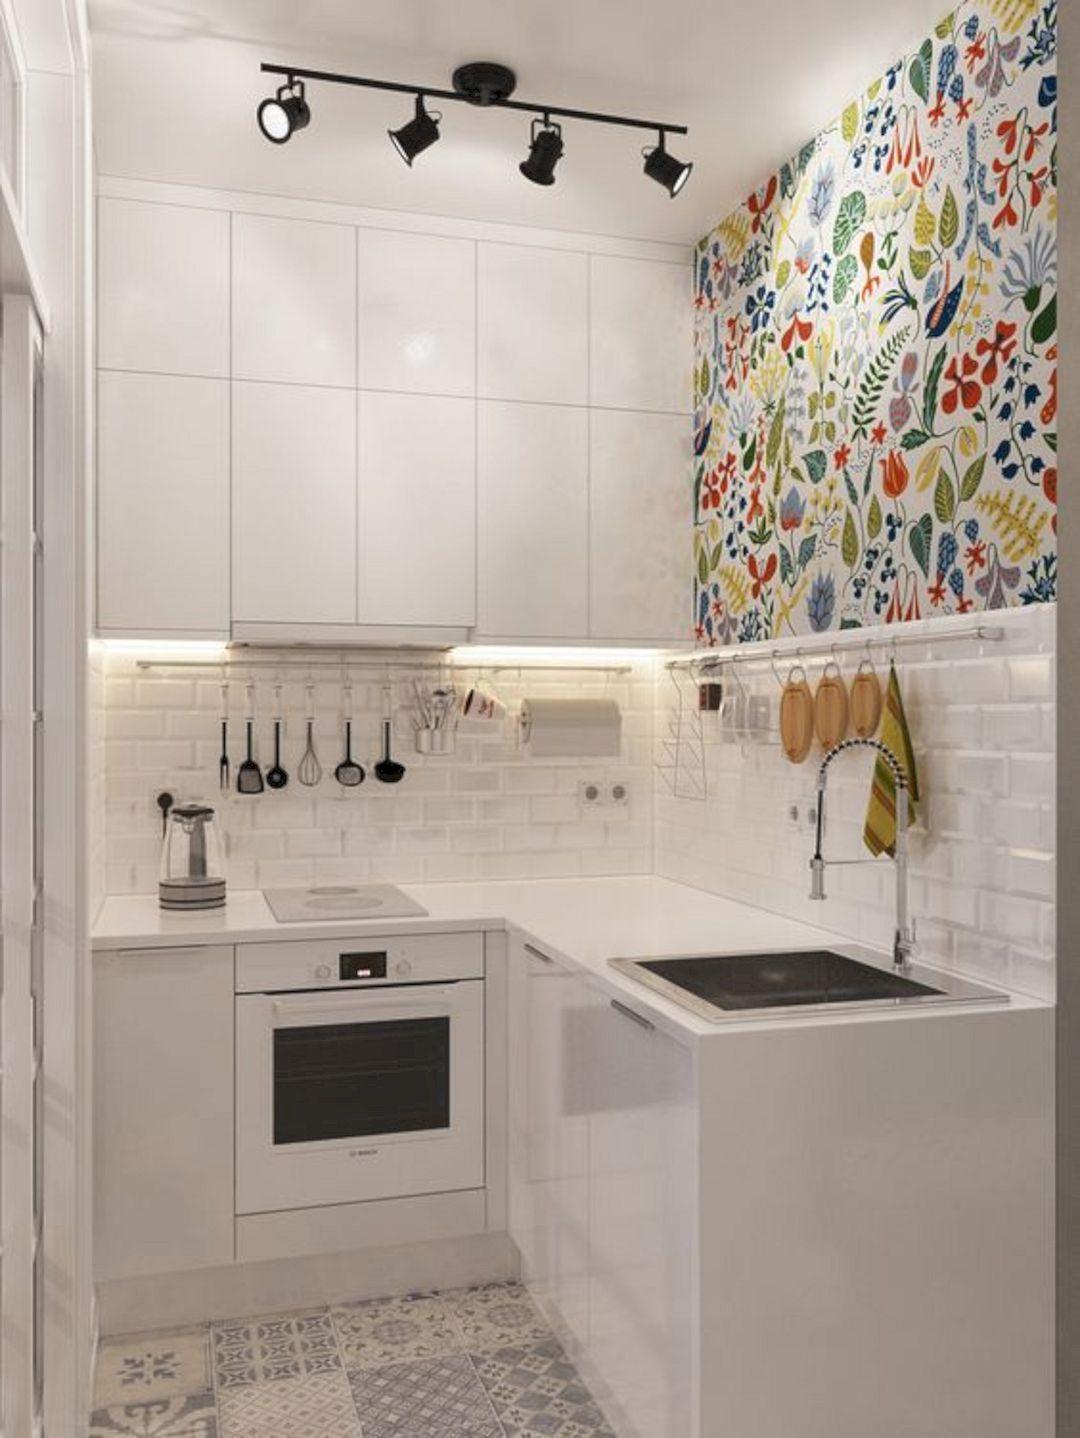 16 Impressive Modern Home Decoration Ideas | Small kitchen ... on modern shower decorating ideas, modern bathroom decorating ideas, modern kitchen tile design, modern kitchen tile flooring,